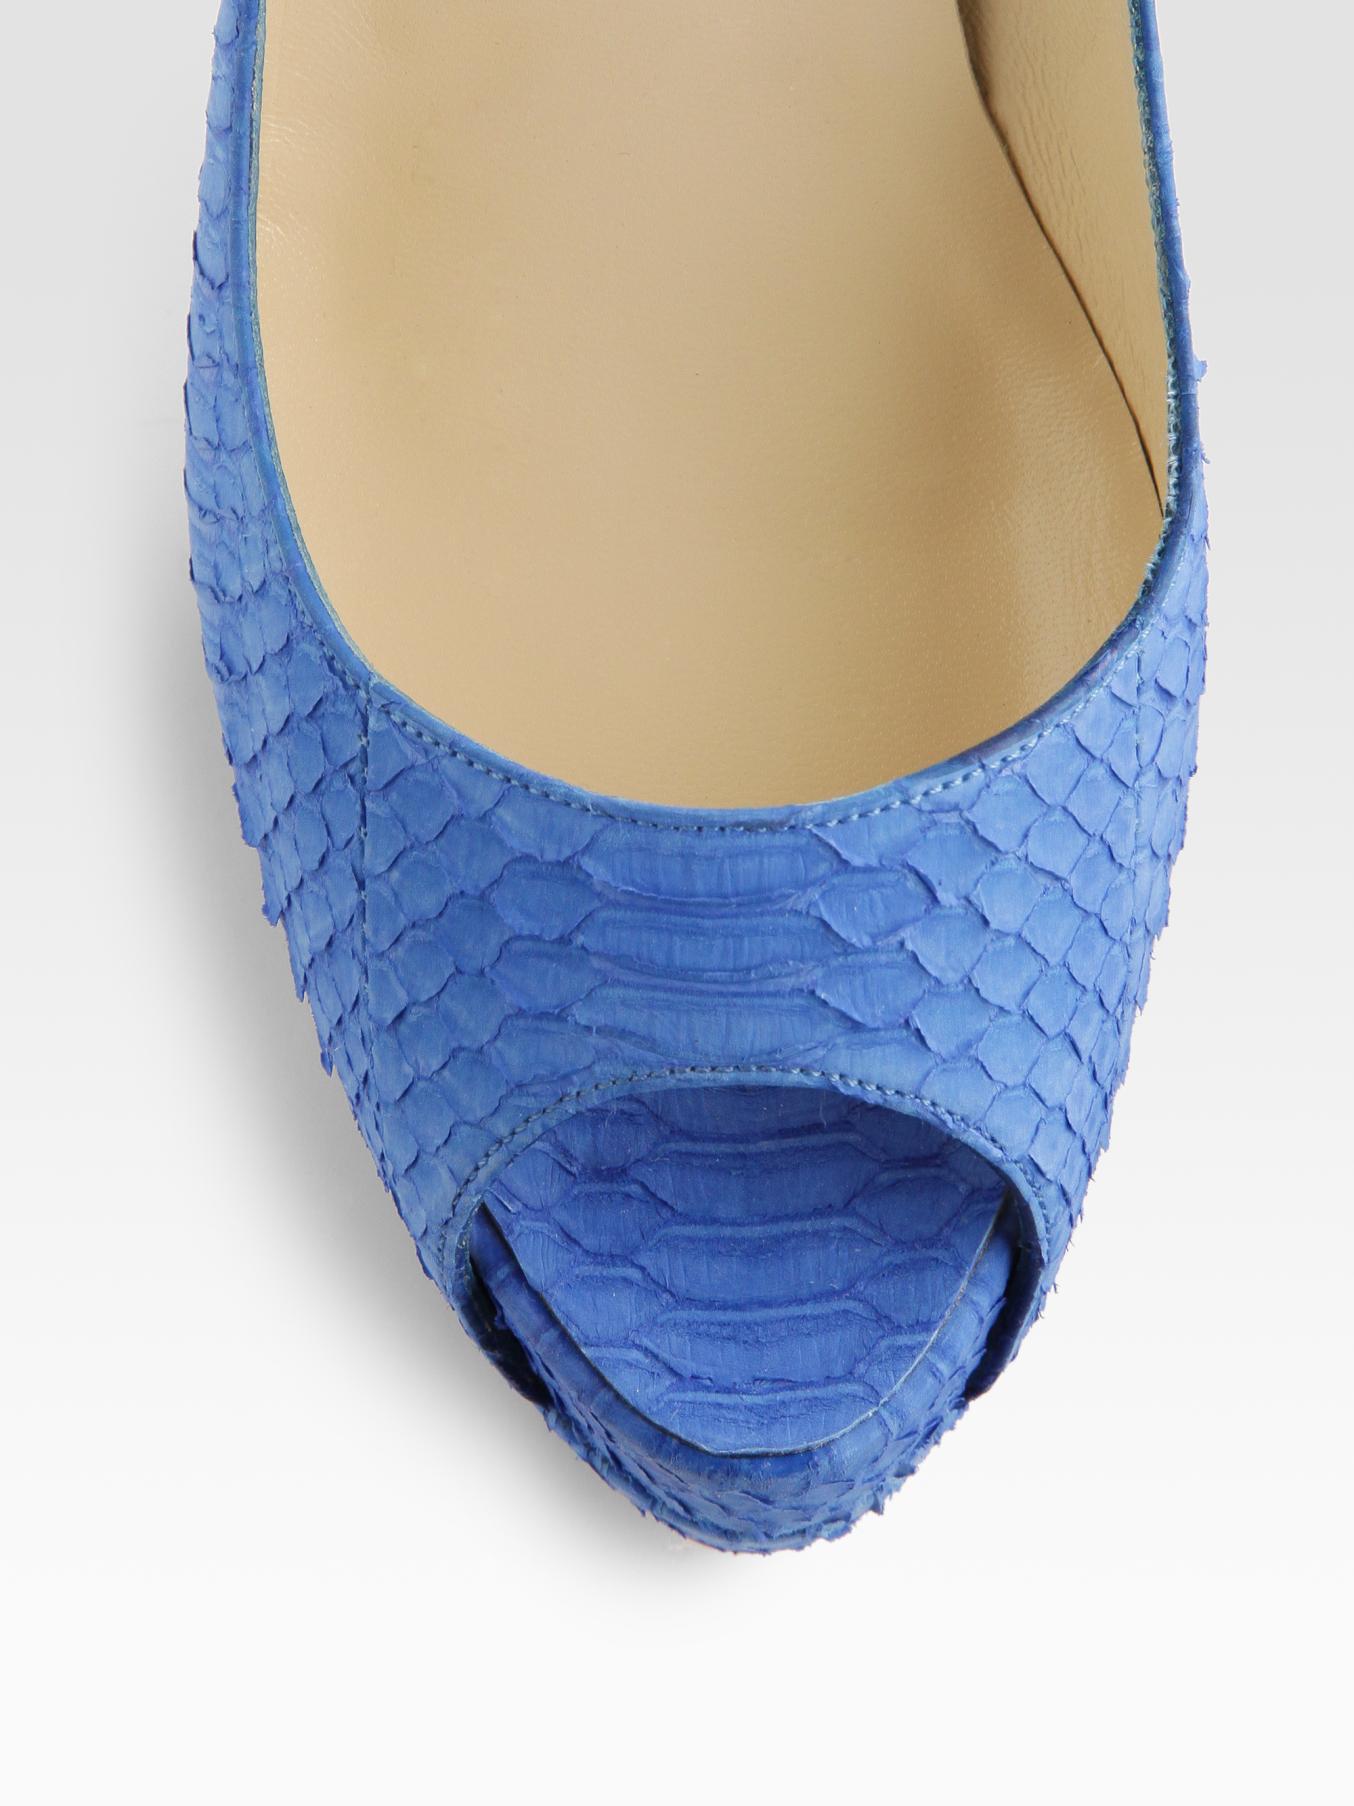 Christian Louboutin Watersnake Peep Toe Pumps Cl Shoes